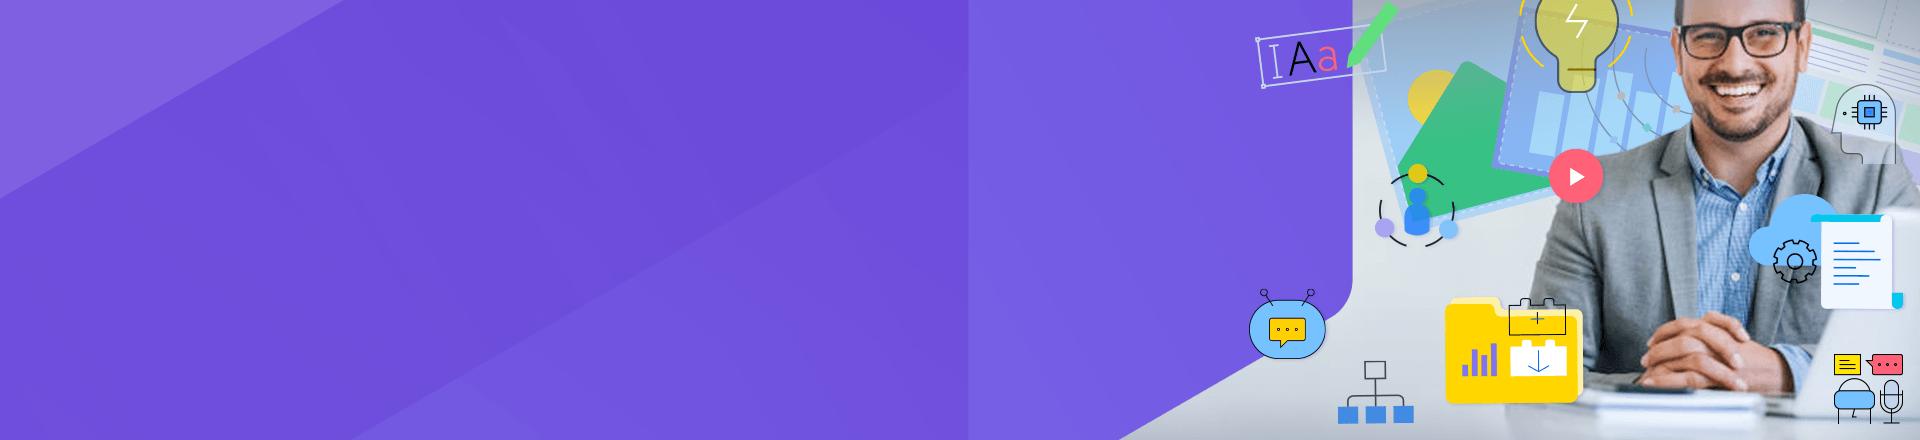 Sitefinity Webinar Savvy Businesses